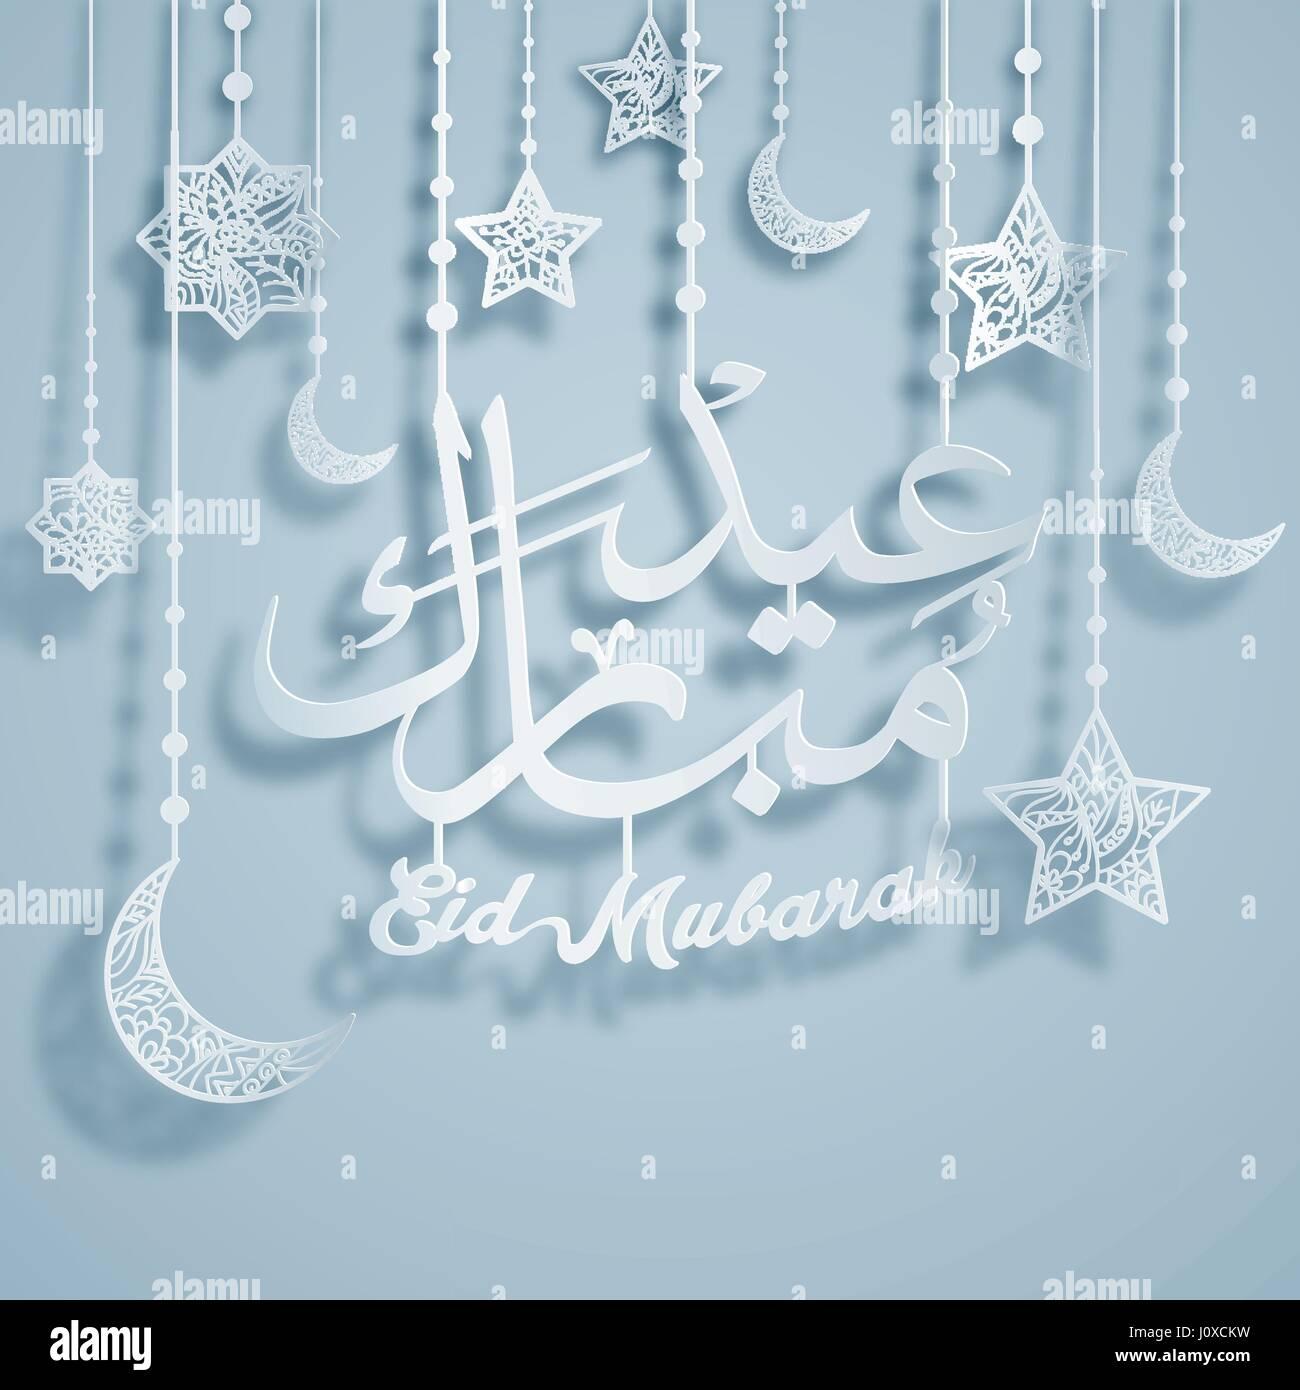 Eid Mubarak Arabic Calligraphy Papercut Style With Islamic Crescent Stock Vector Image Art Alamy